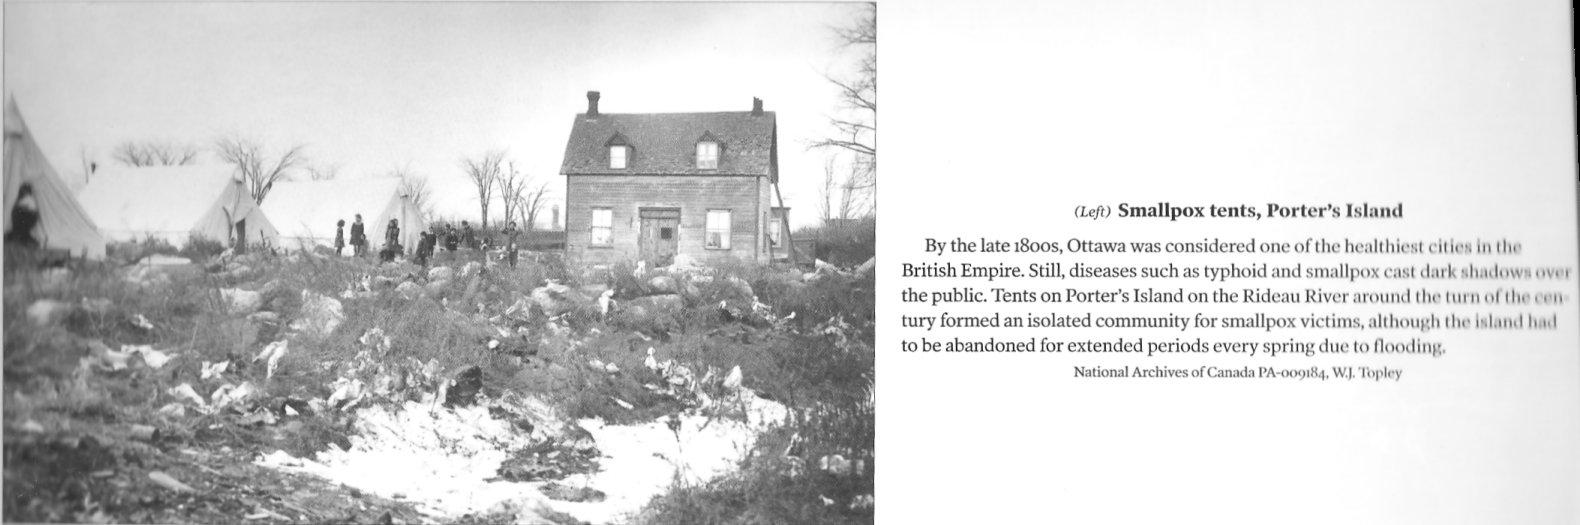 Porter's Island Quarantine Station, Ottawa, Ontario, Canada